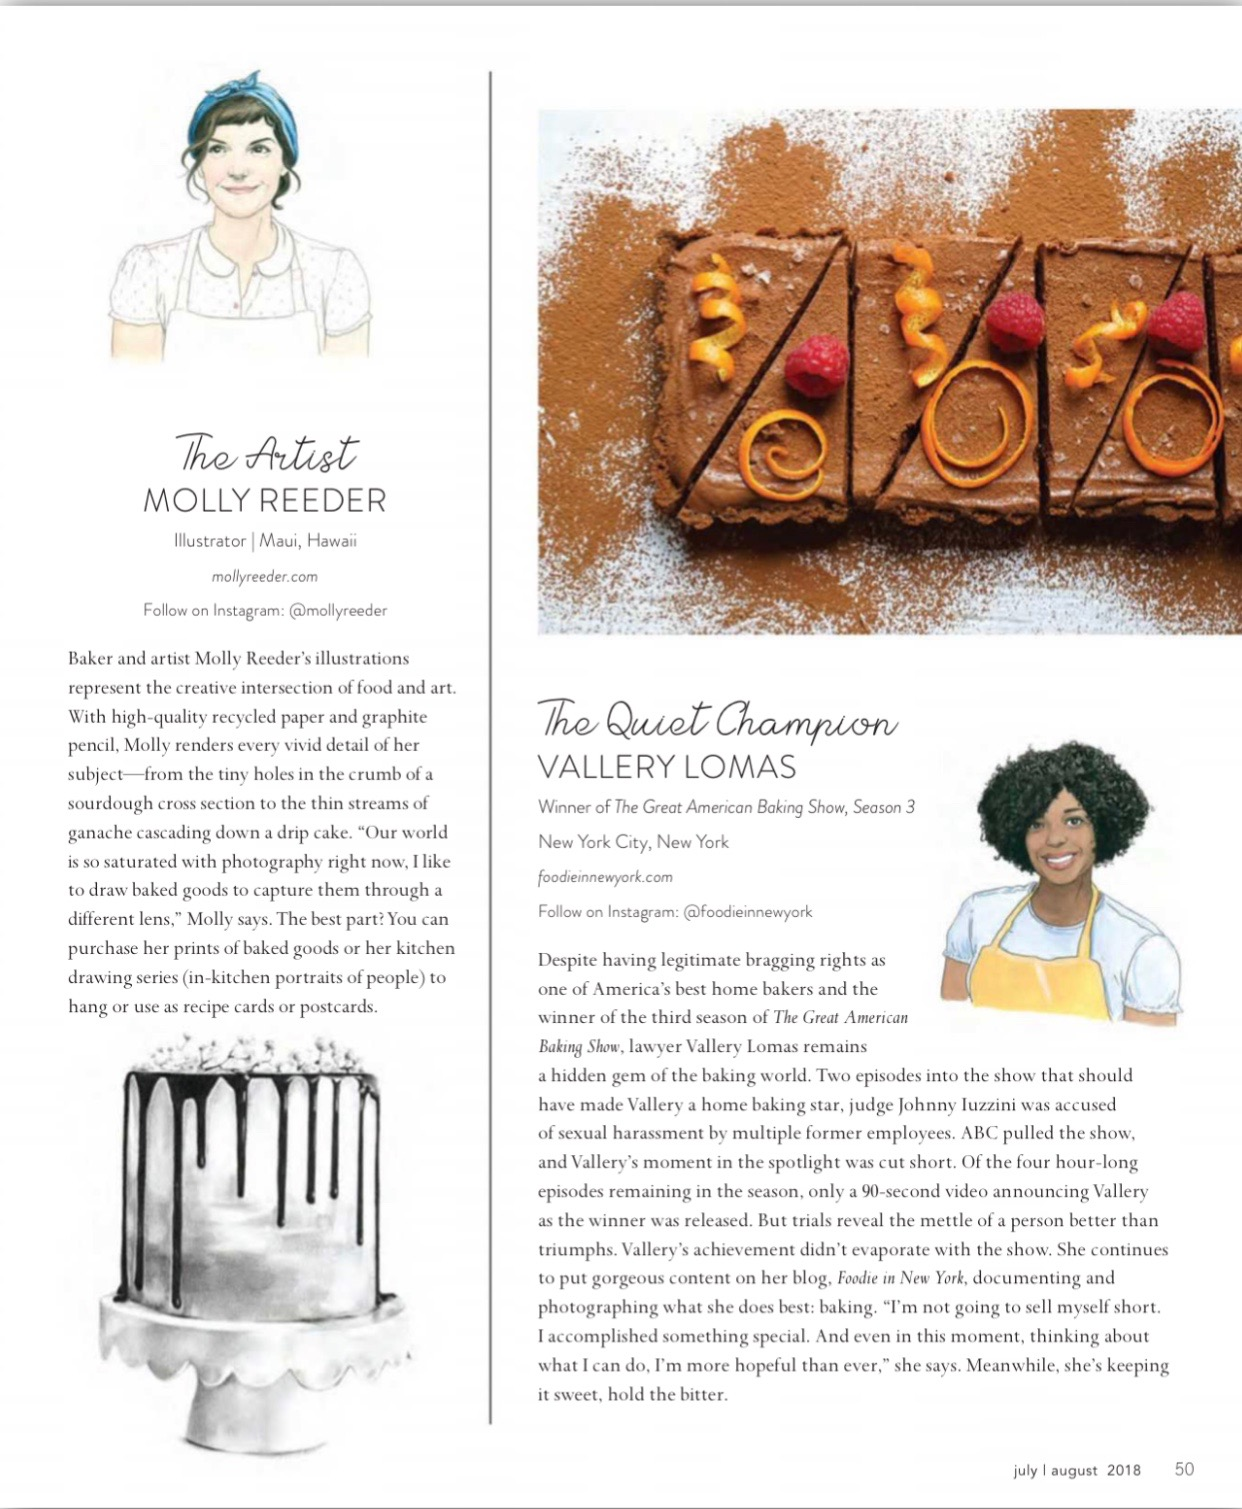 bake from scratch feature .JPG